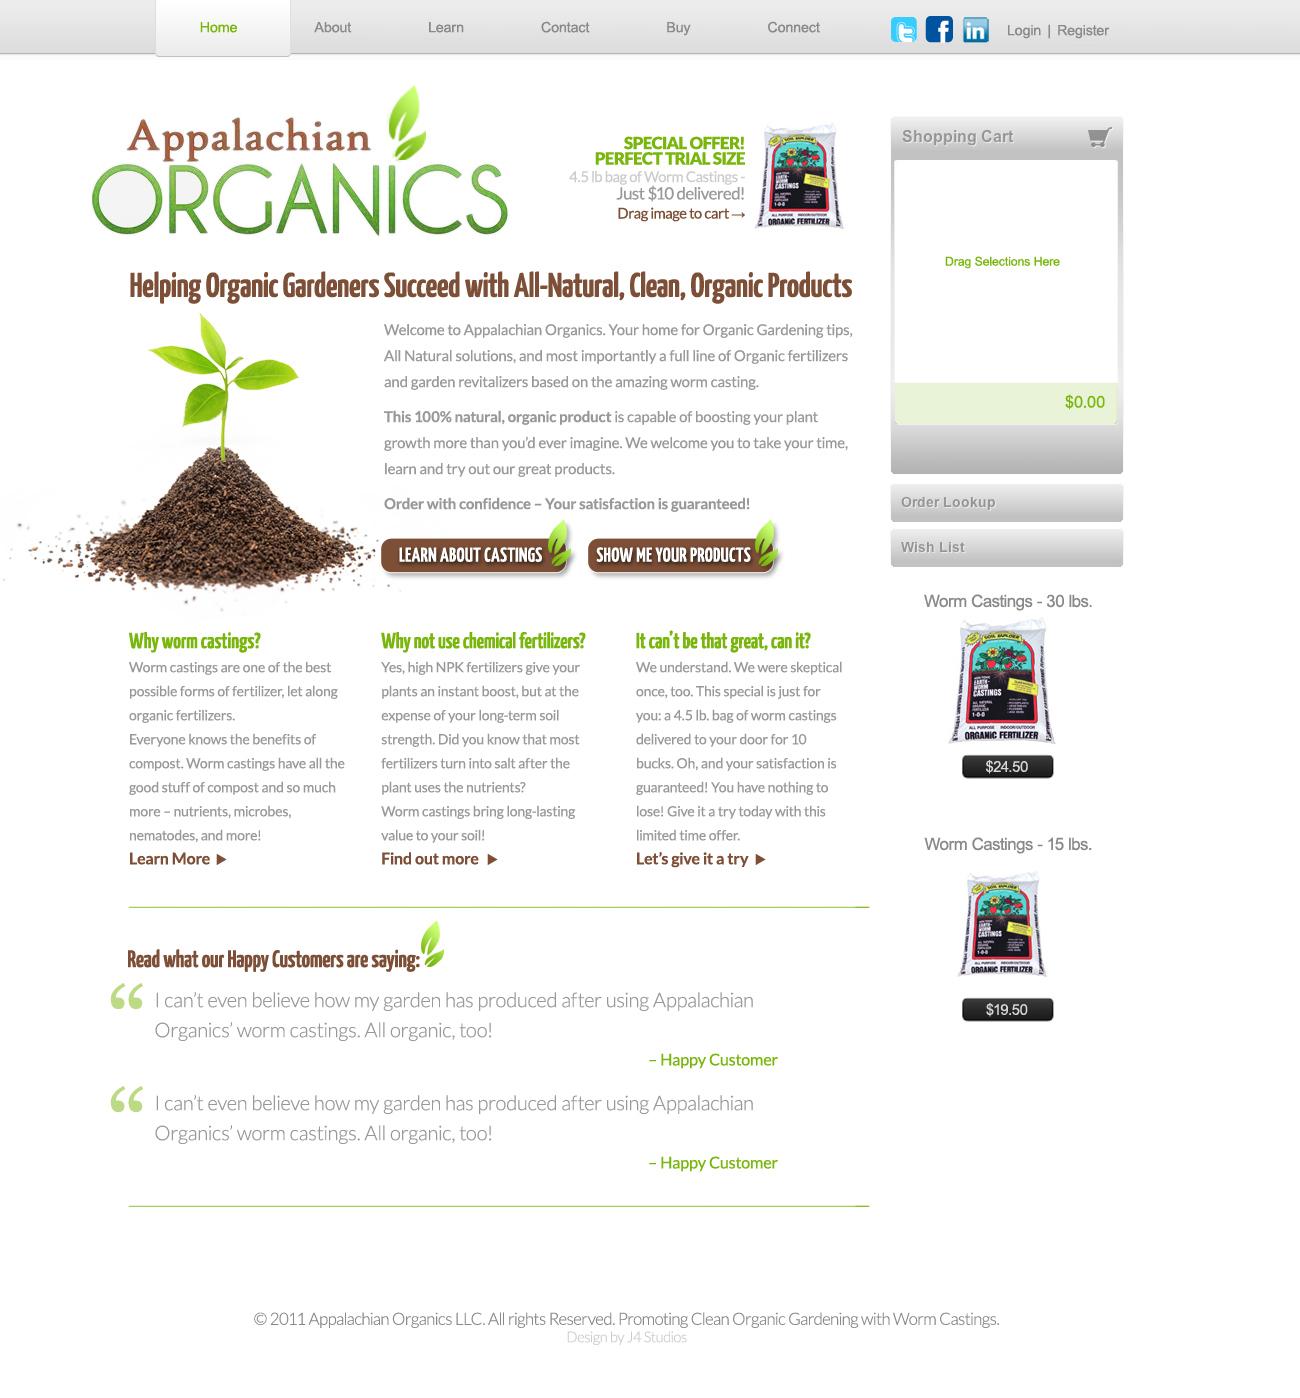 Appalachian Organics